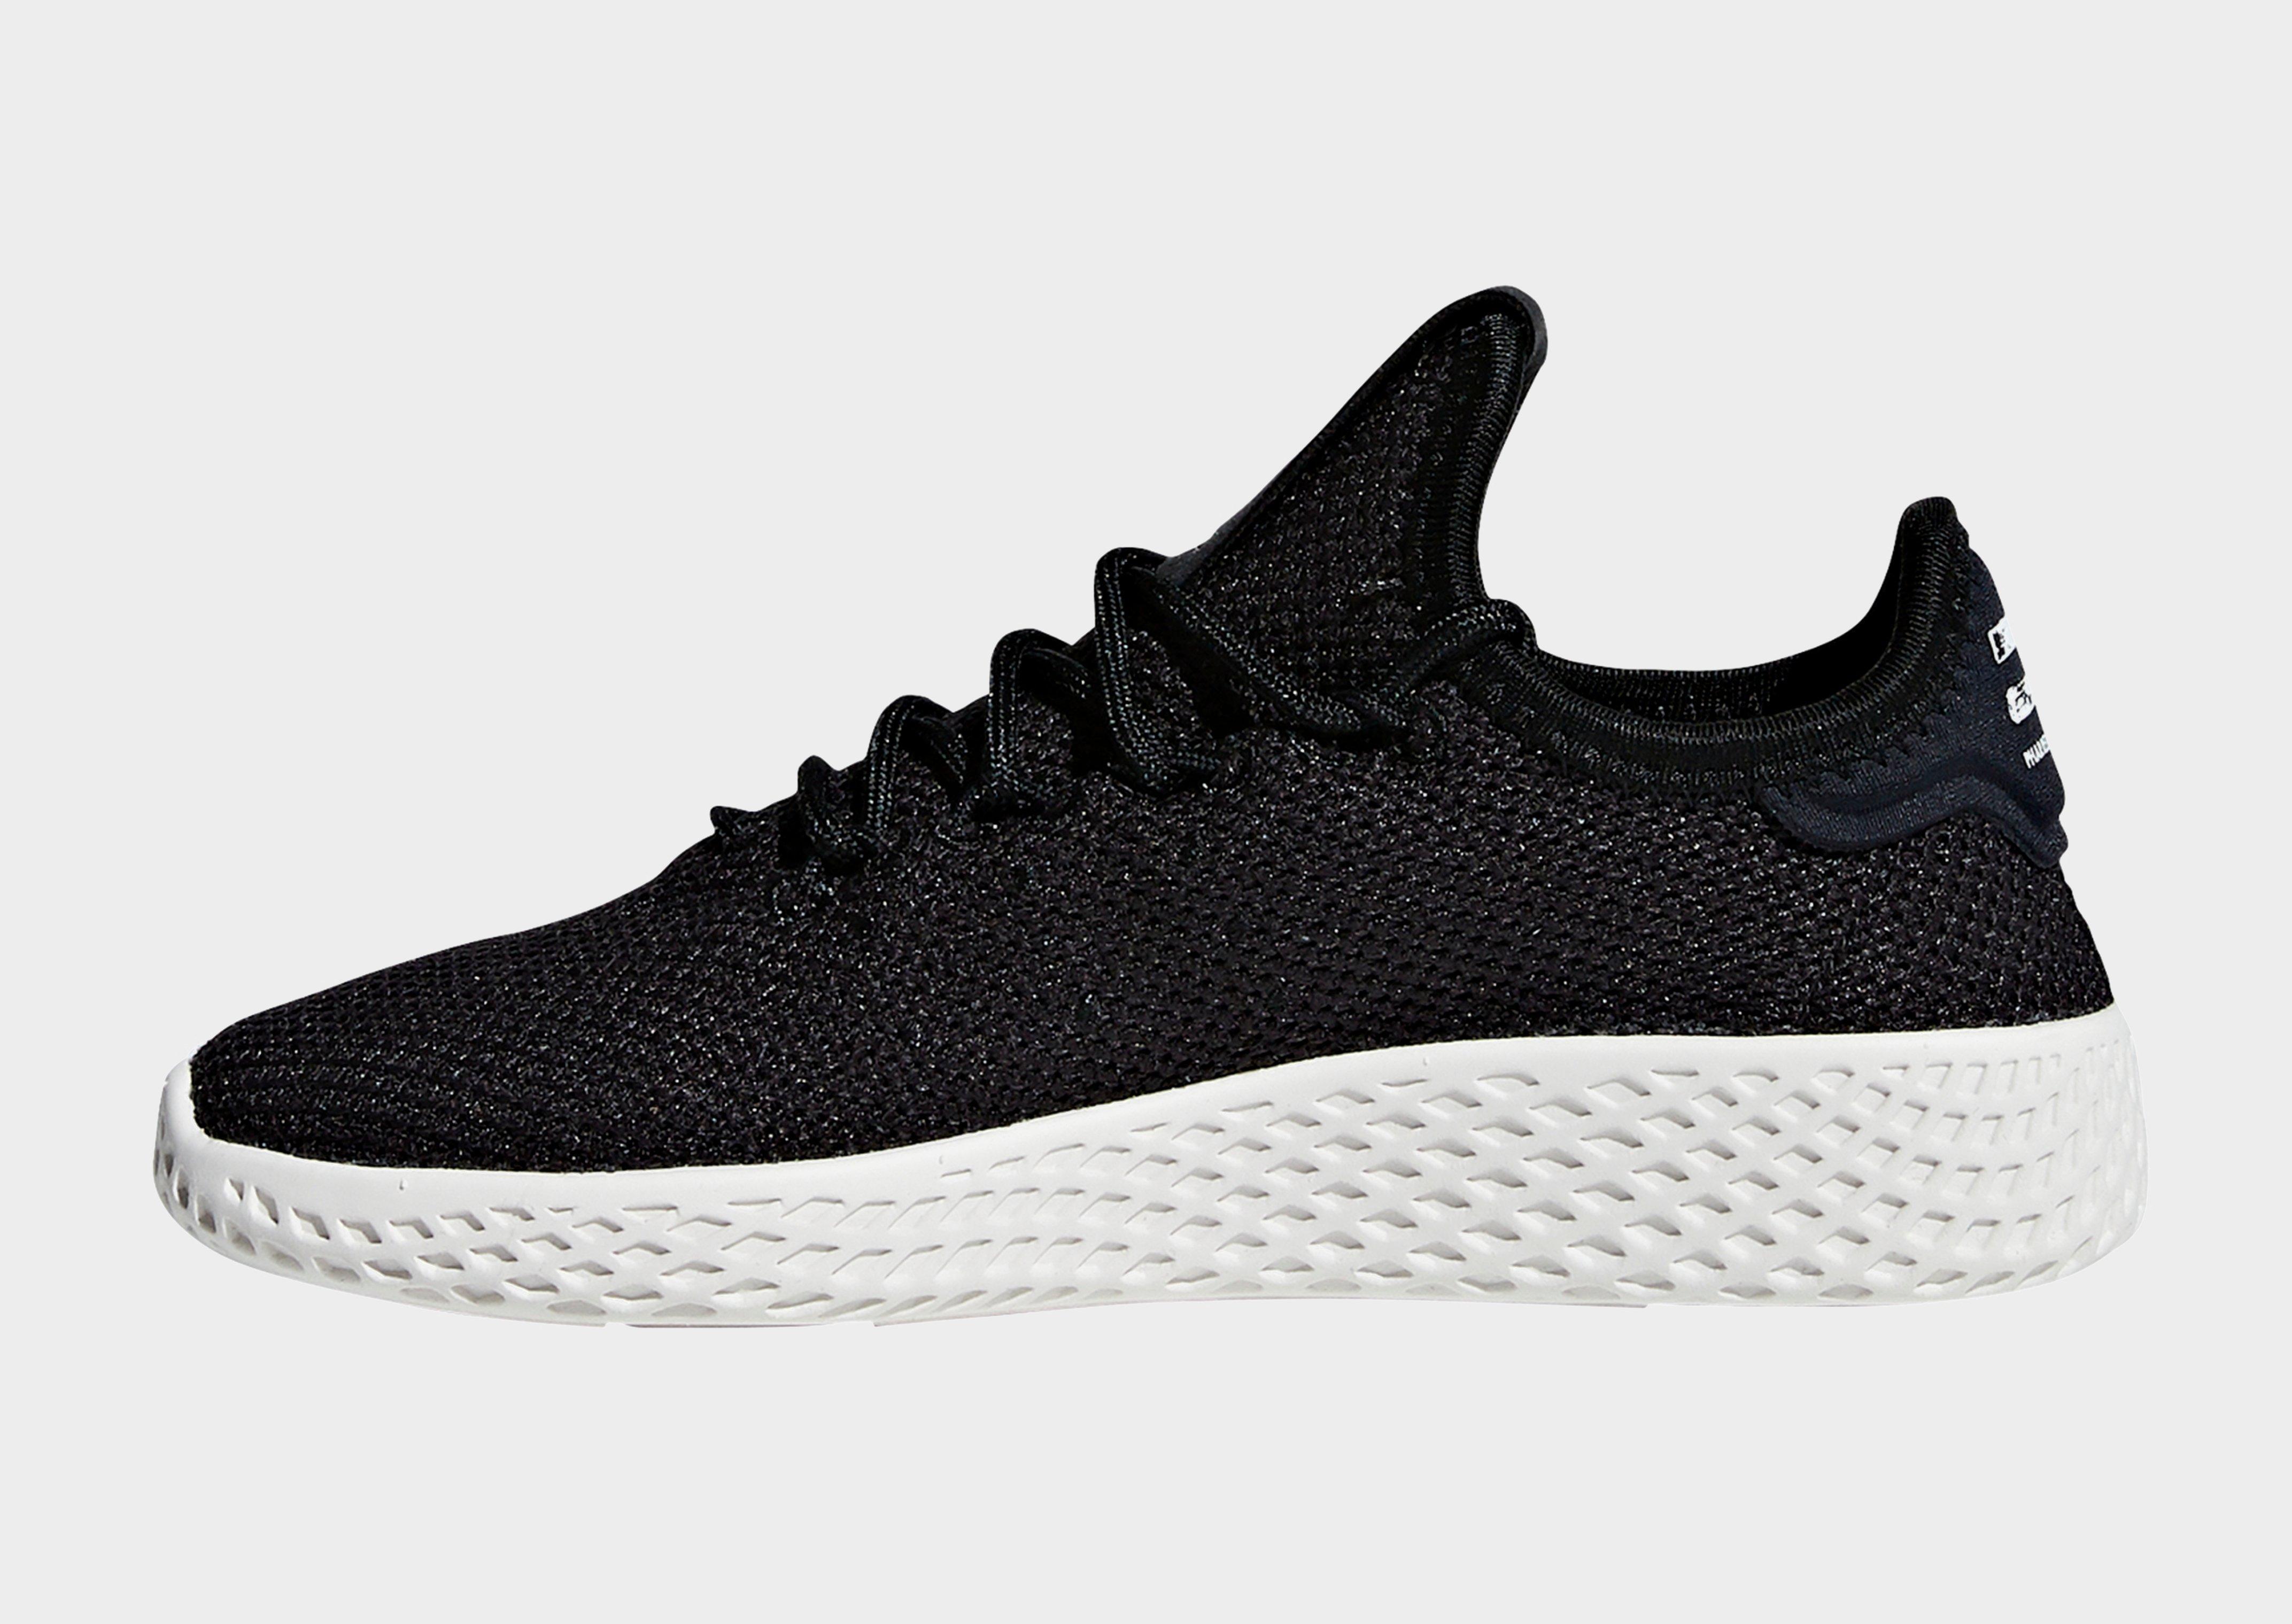 149985acb Lyst - Adidas Pharrell Williams Tennis Hu Shoes in Black for Men